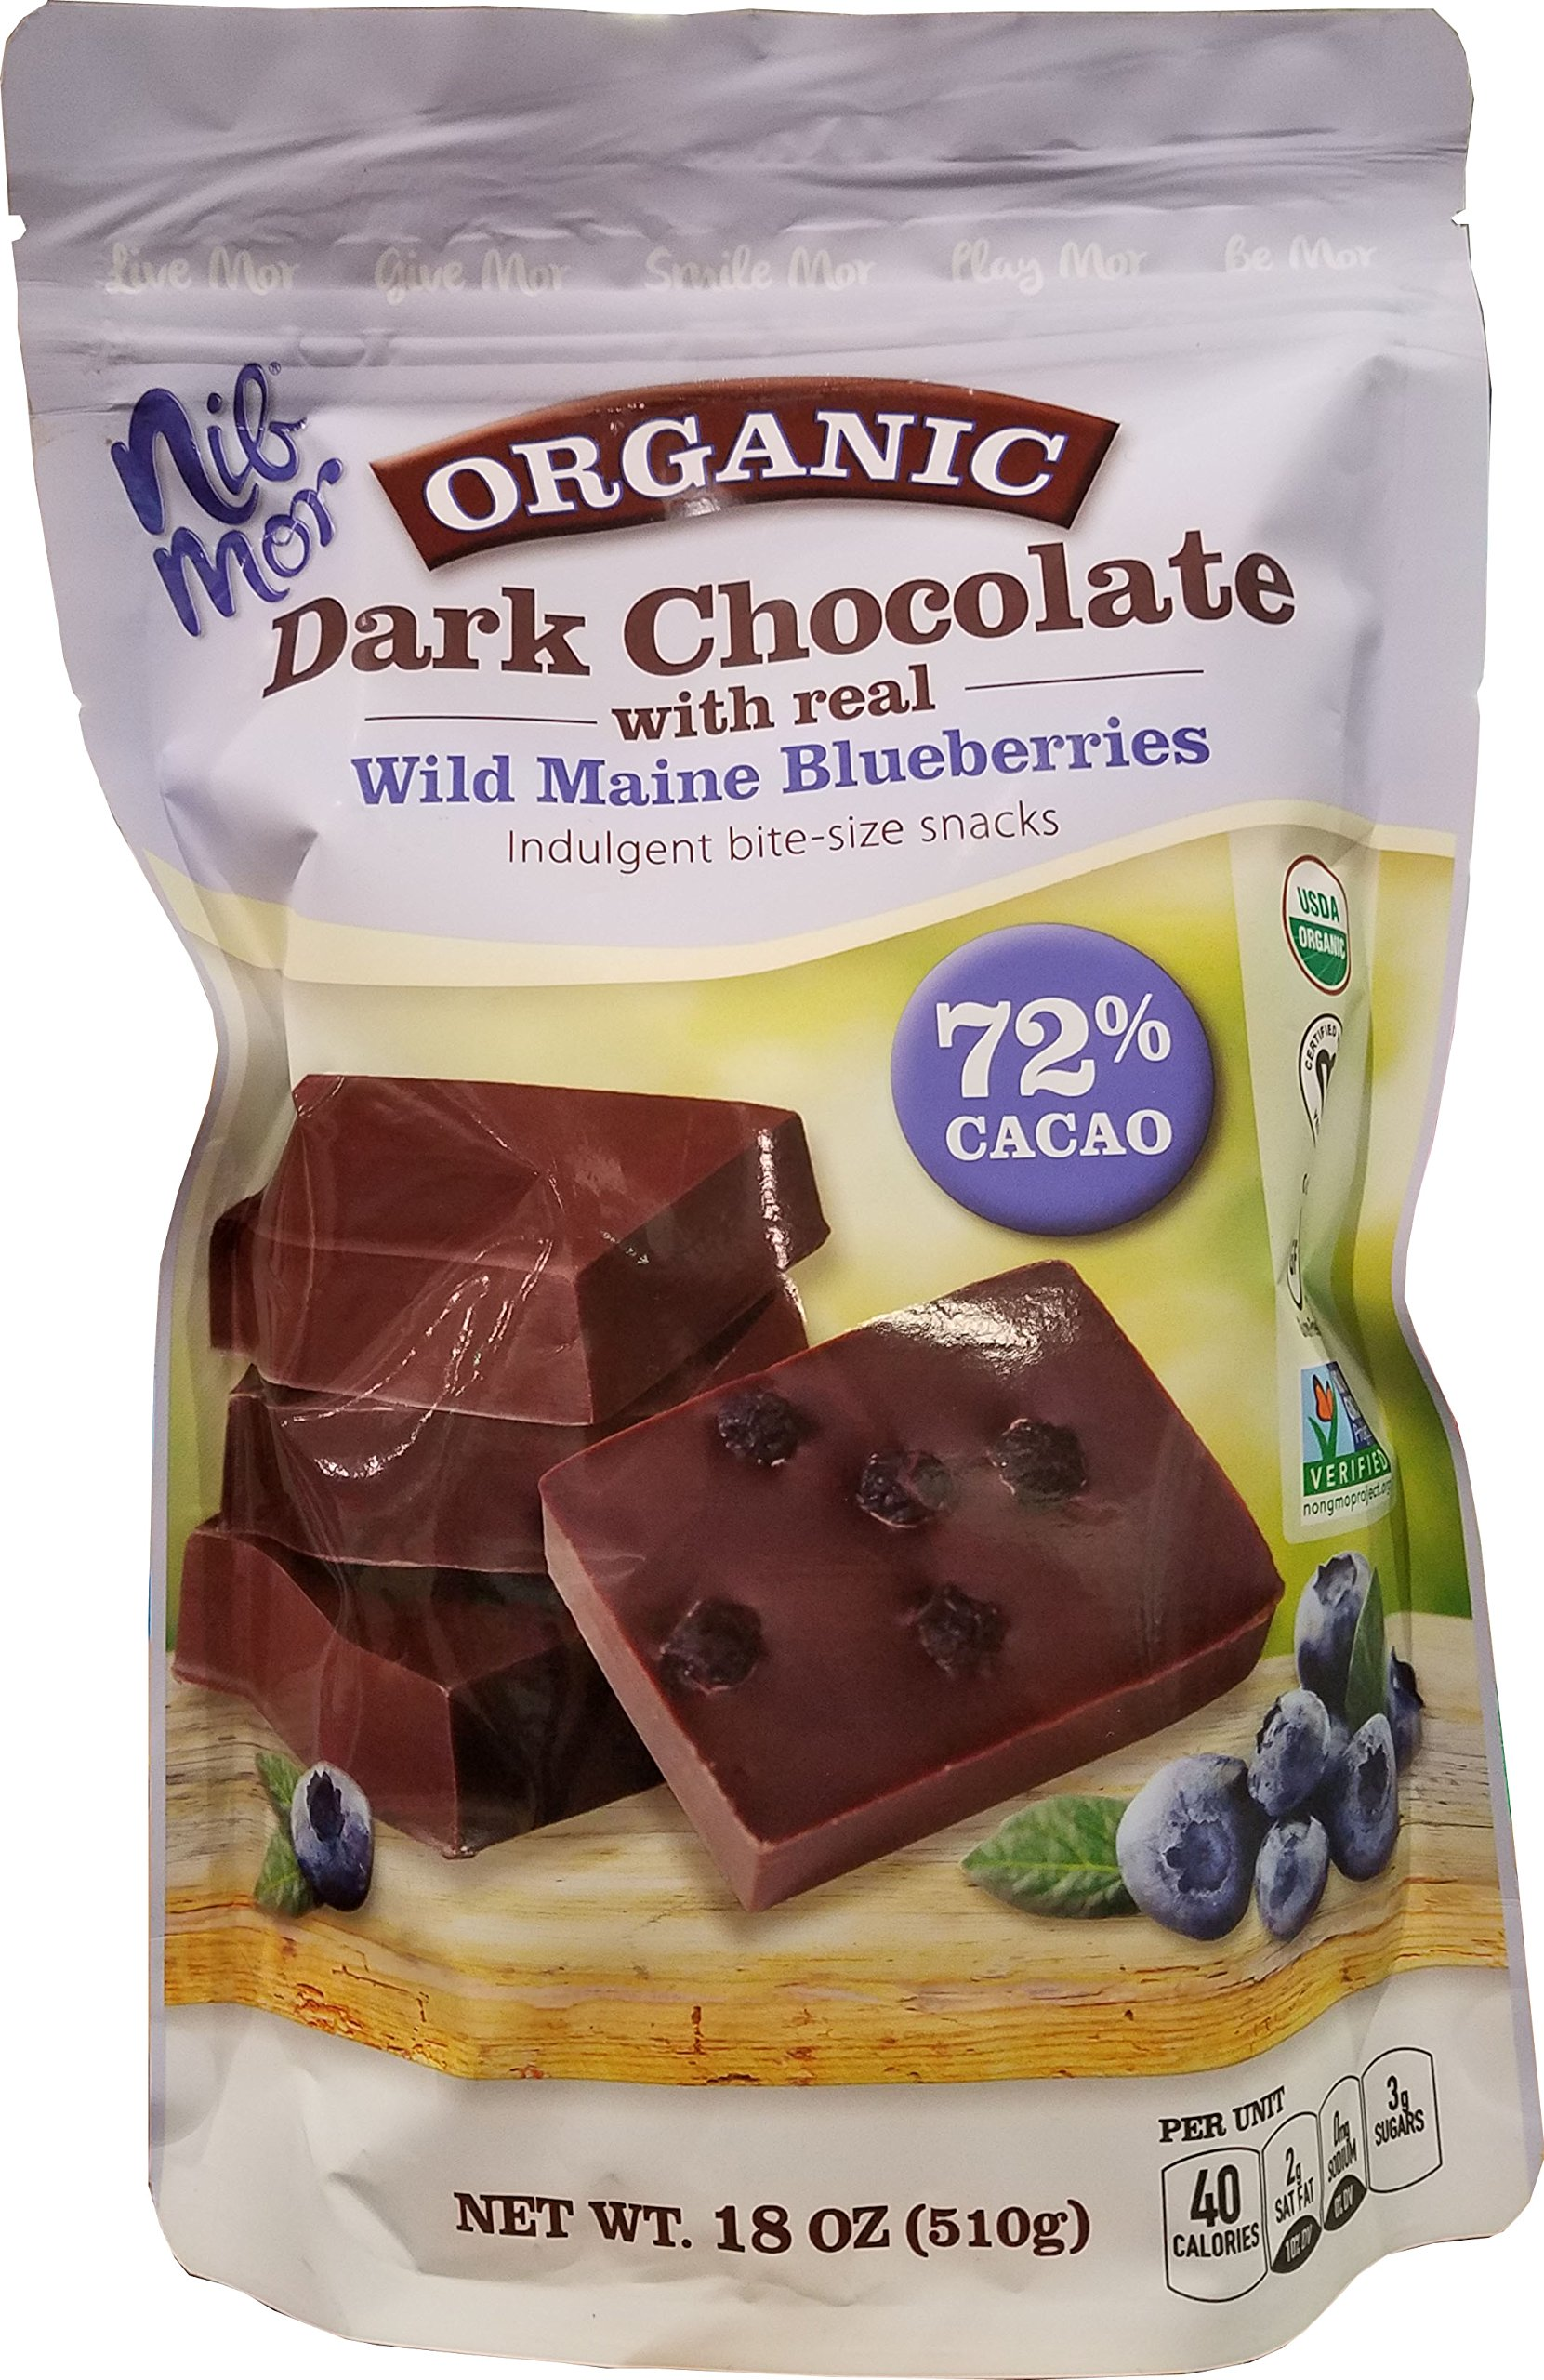 CDM product Nibmor Organic Dark Chocolate Wild Maine Blueberries, 18 Oz, 510g big image